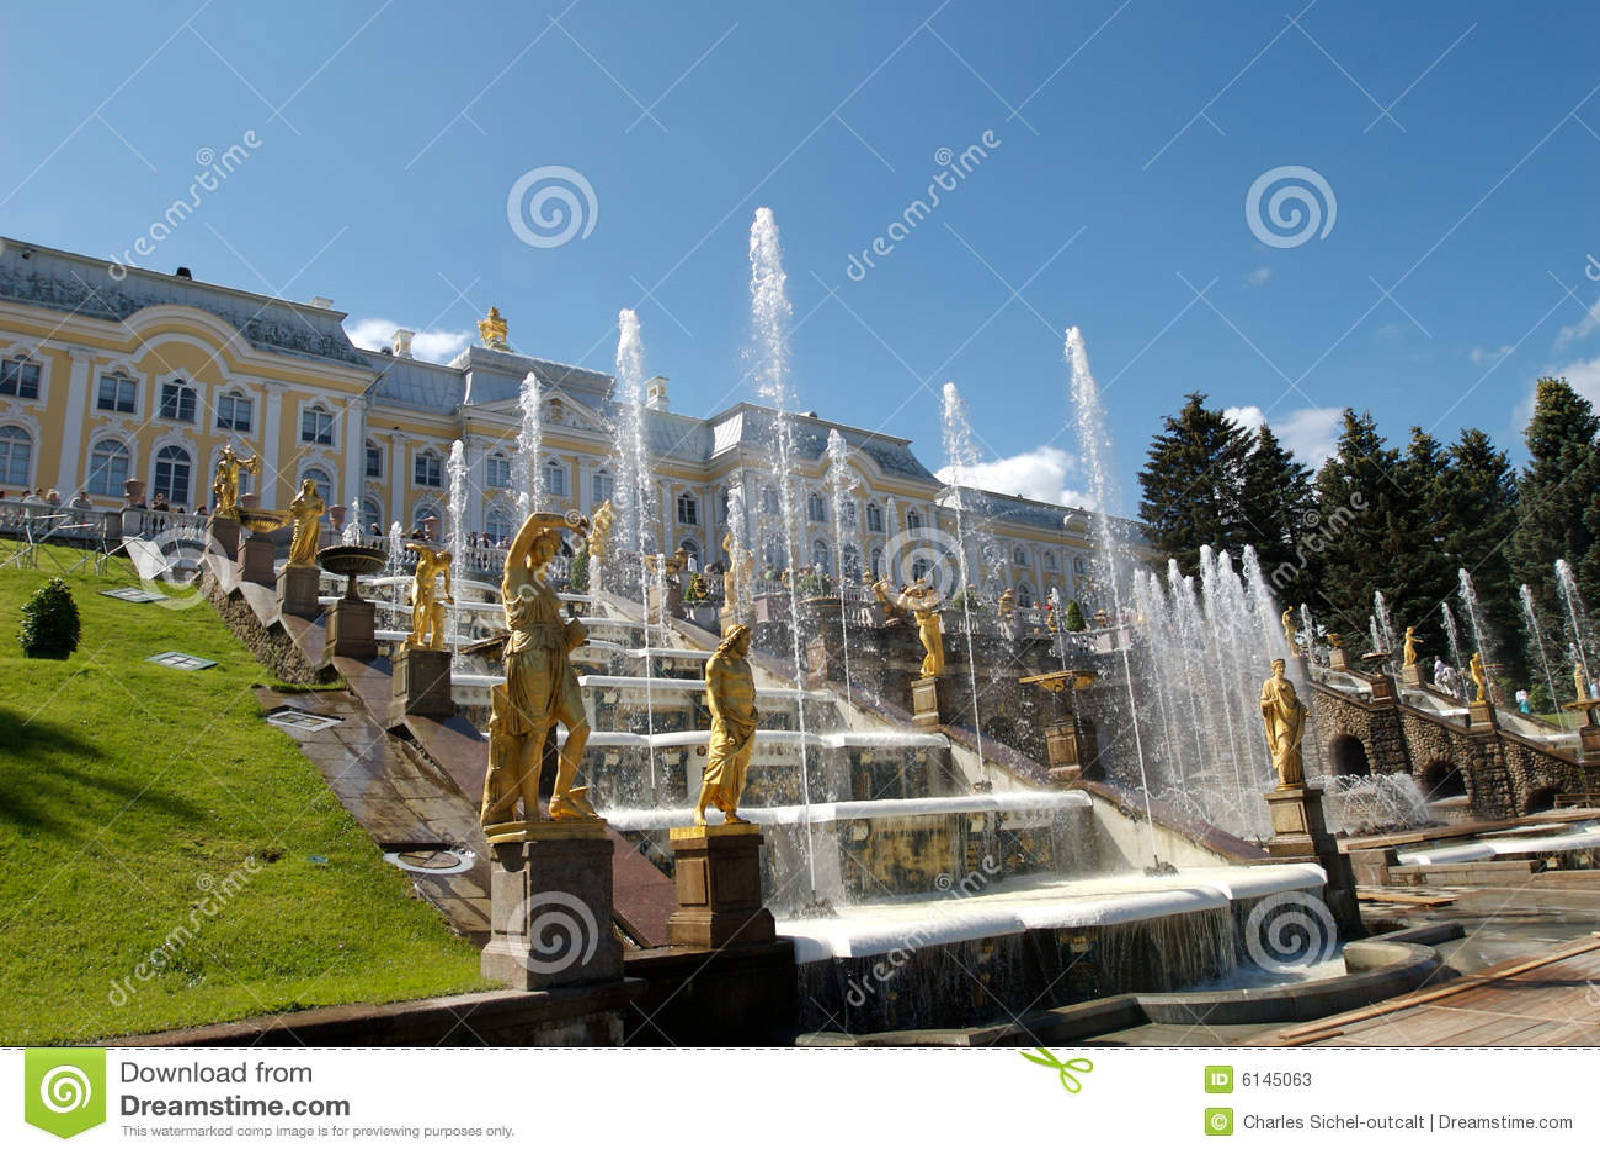 Peterhof Palace fountains